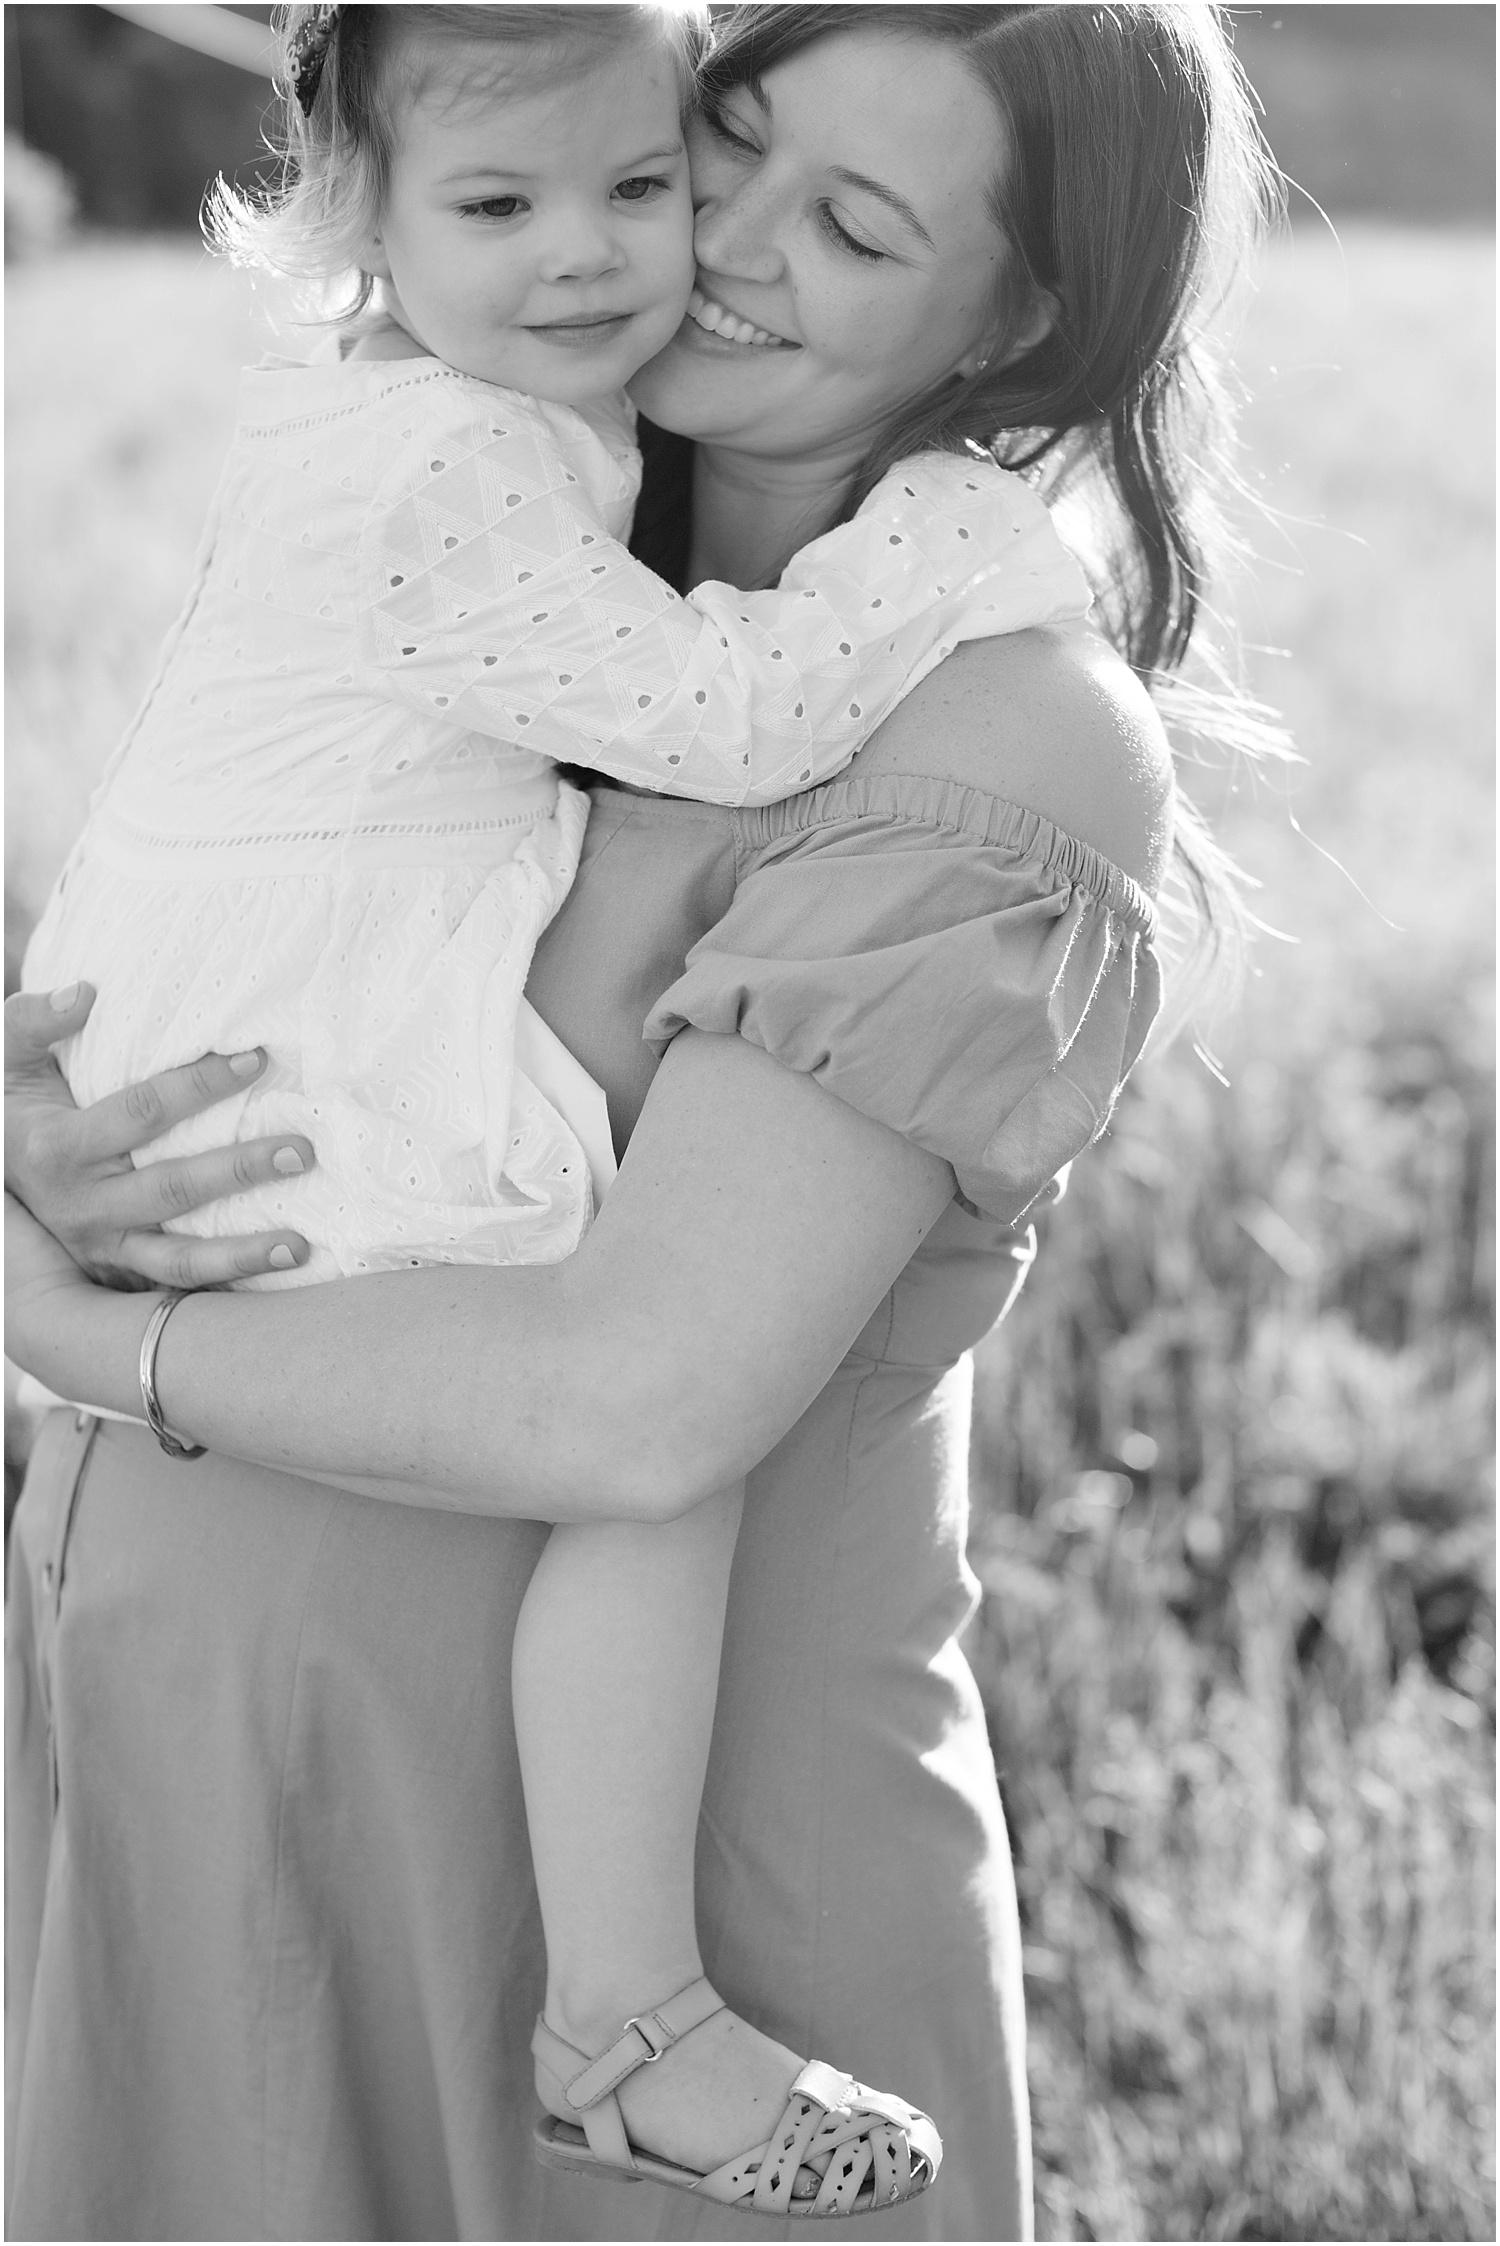 astleigh hill maternity session_0001.jpg